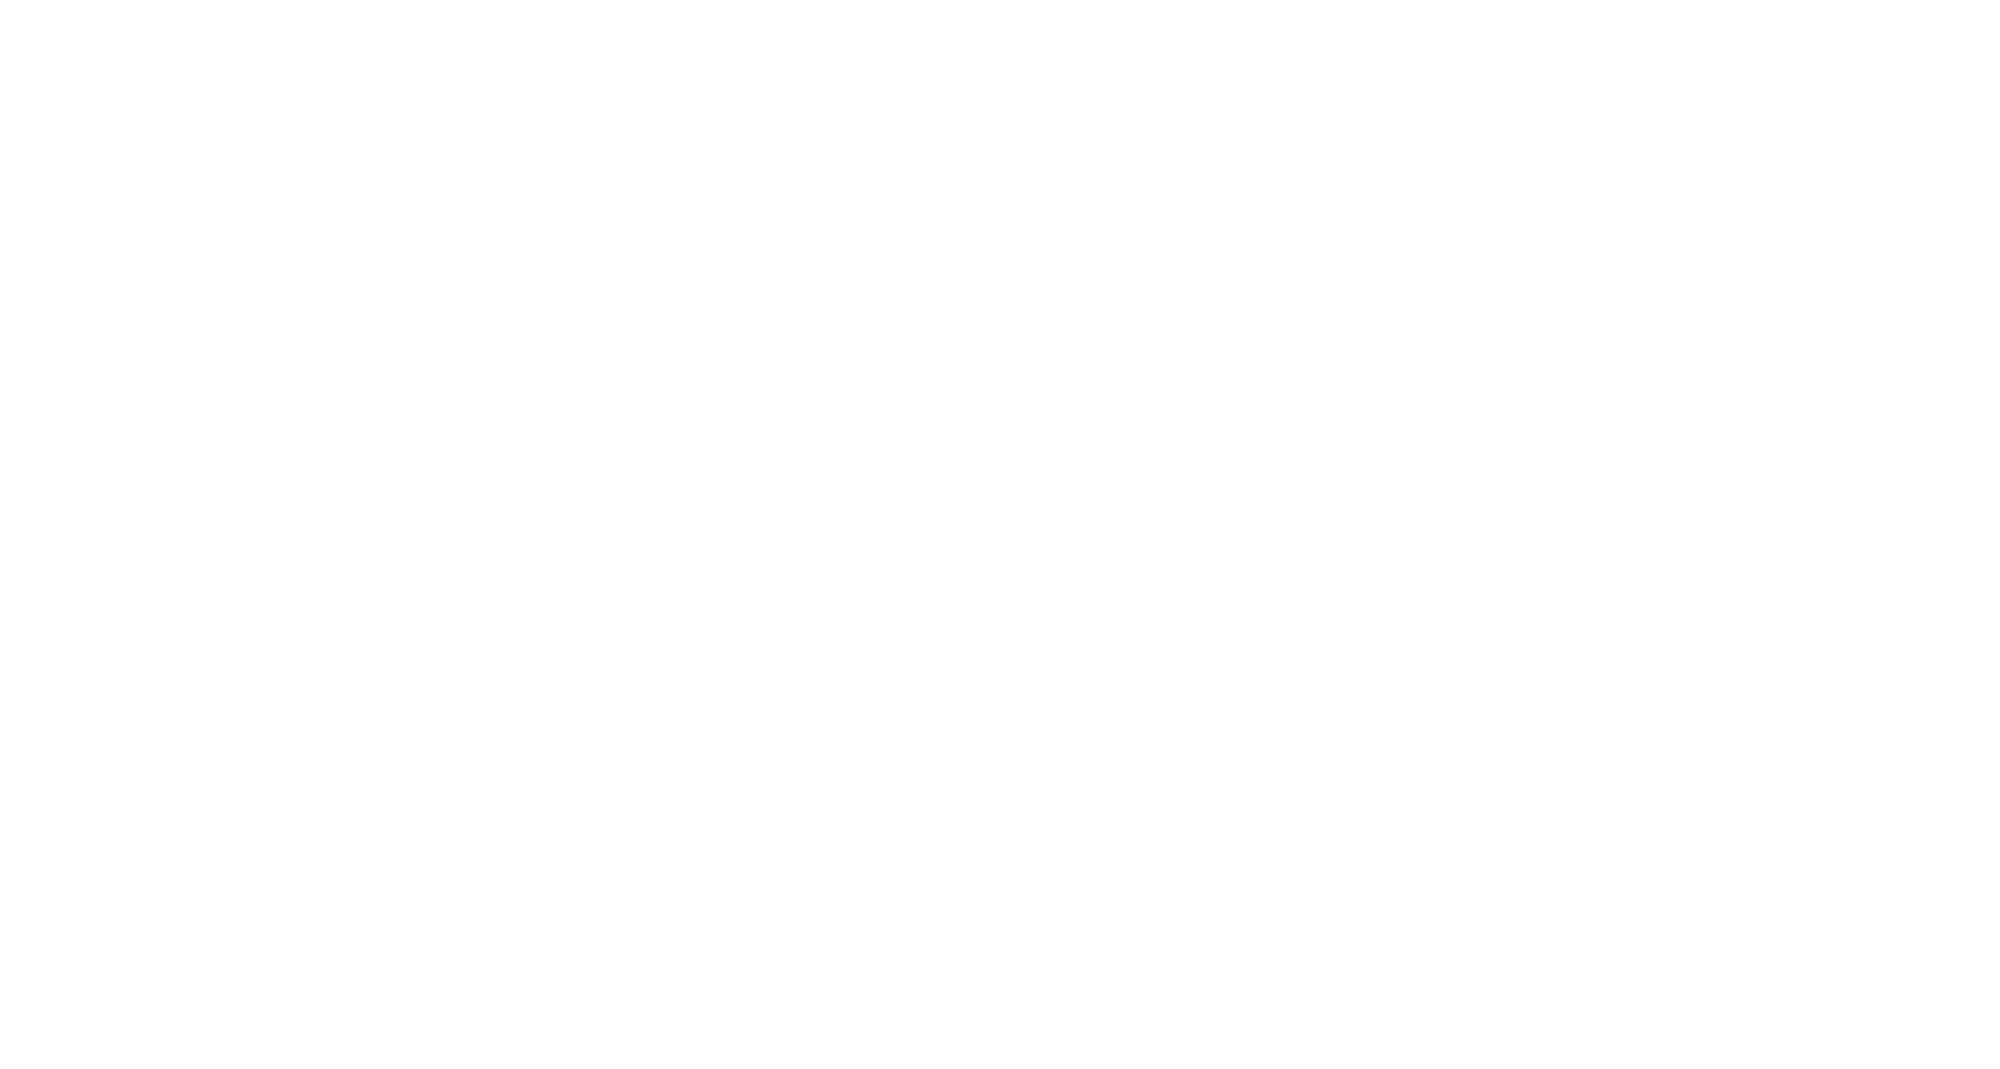 dvelop-logo-invers-Oct-27-2020-08-10-16-55-AM